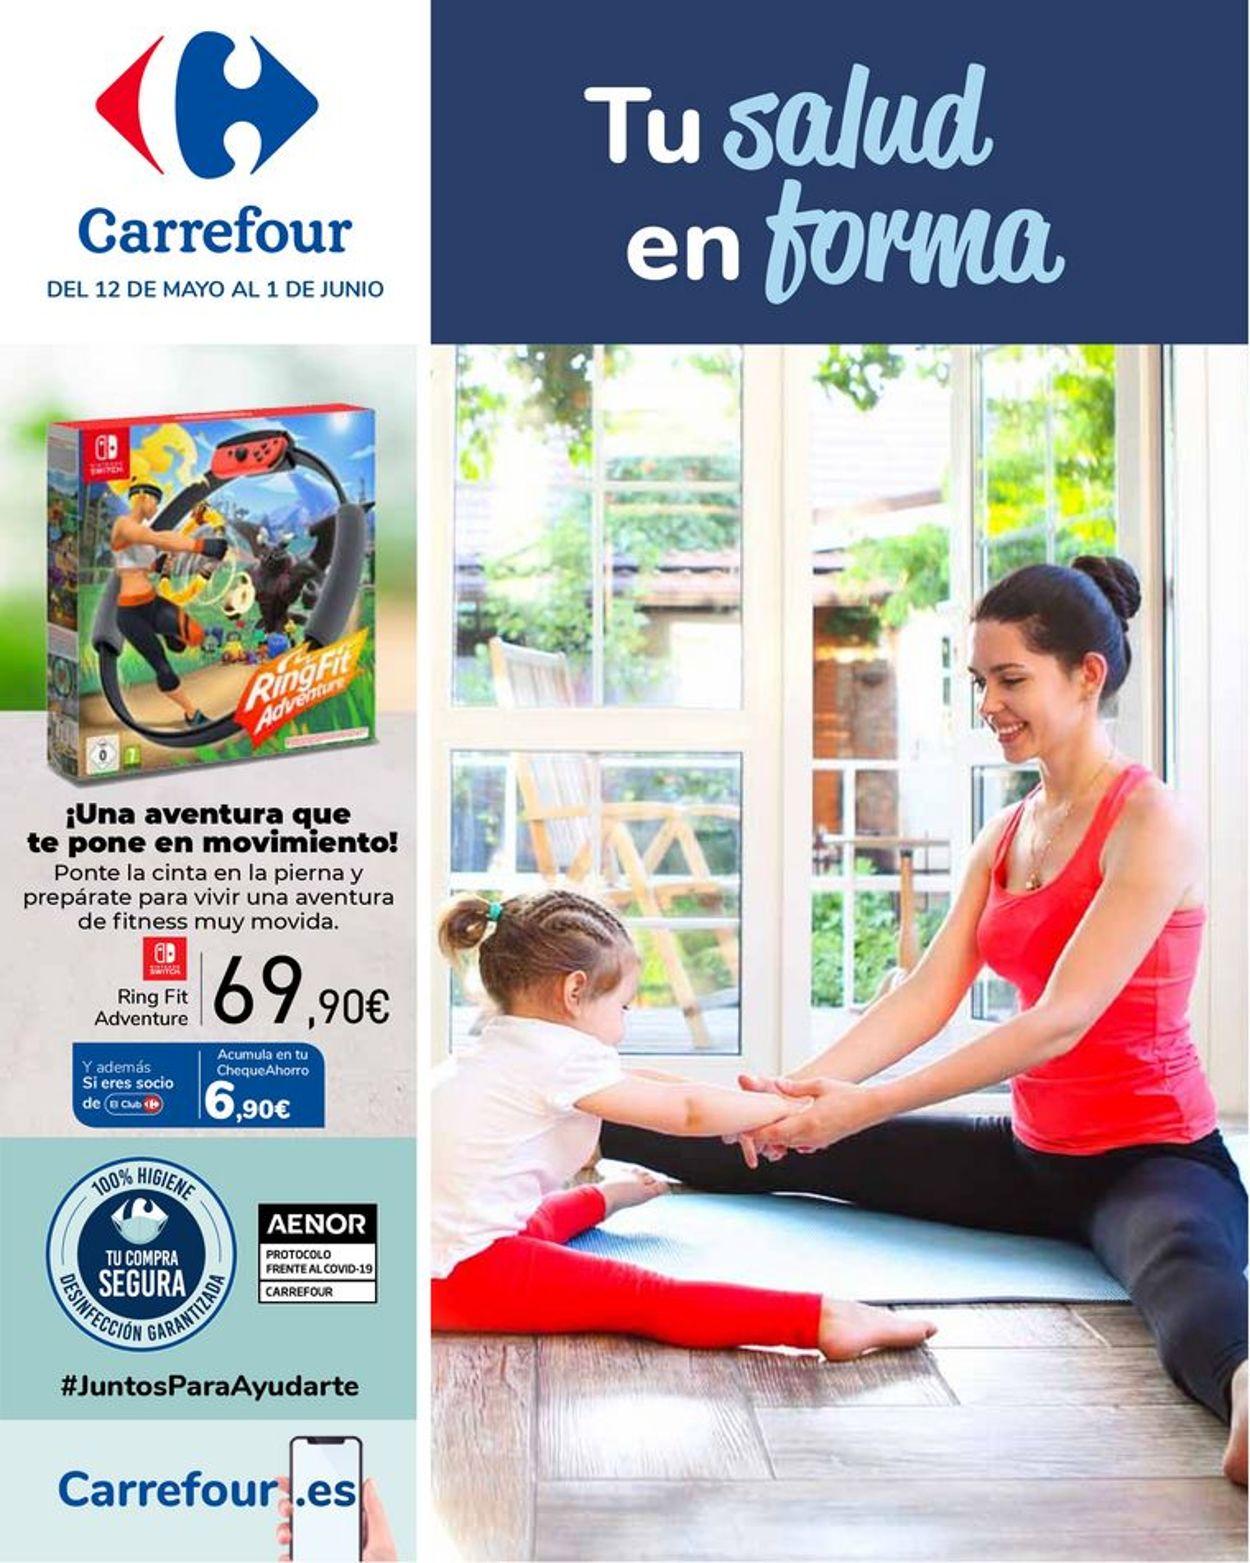 Carrefour Tu salud en forma Folleto - 12.05-01.06.2021